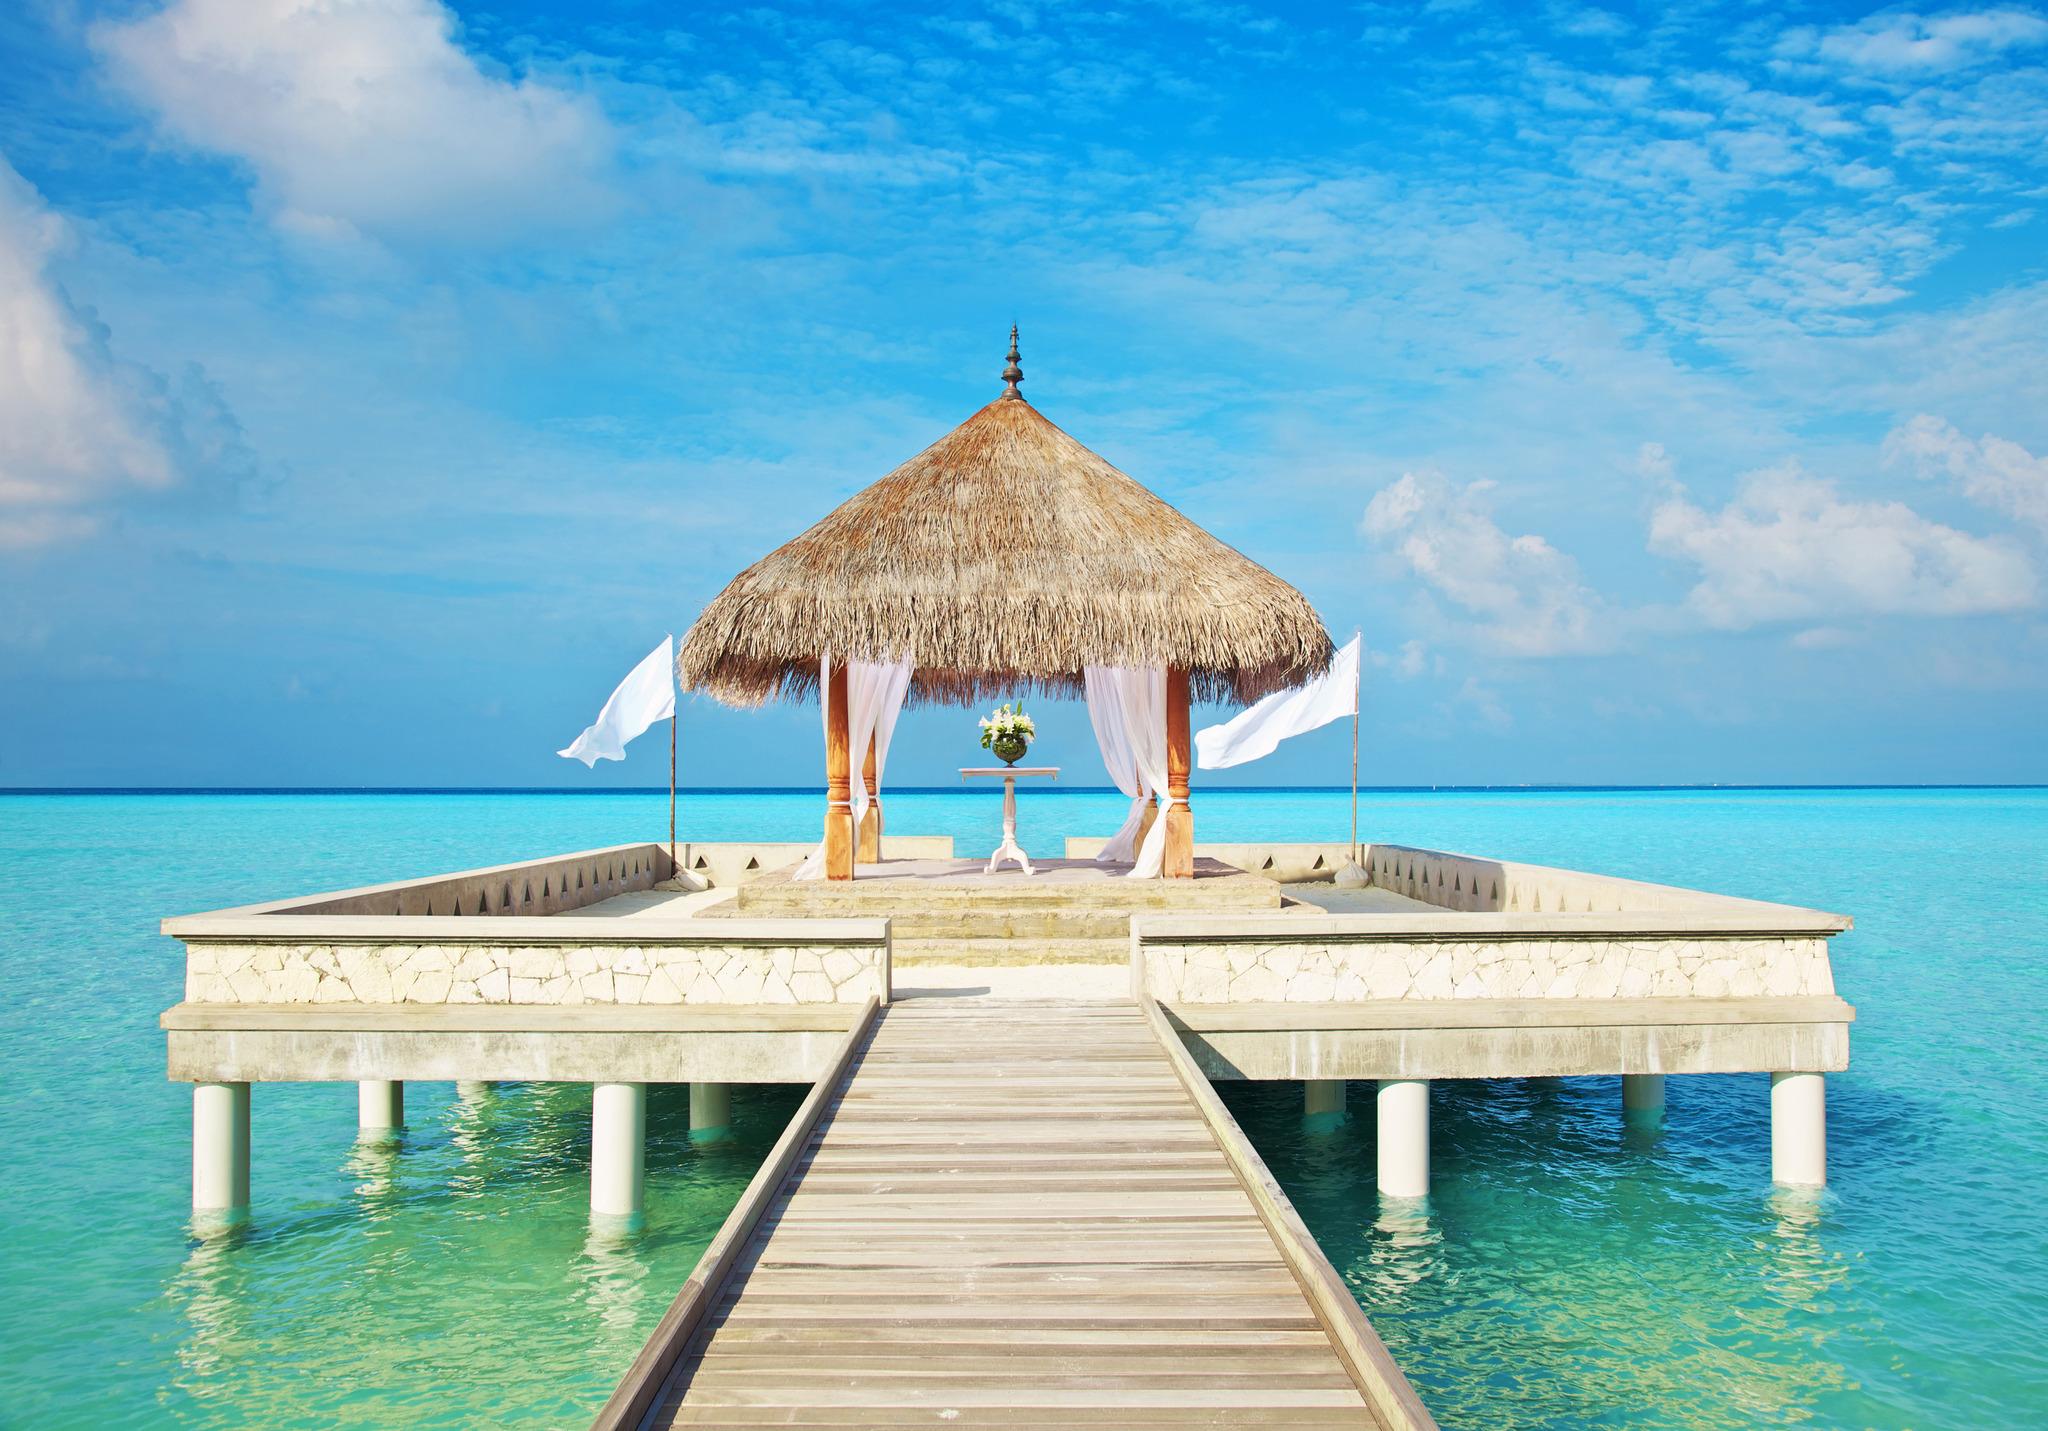 Maldives Wedding, Photo Credit:  Hotels in Heaven